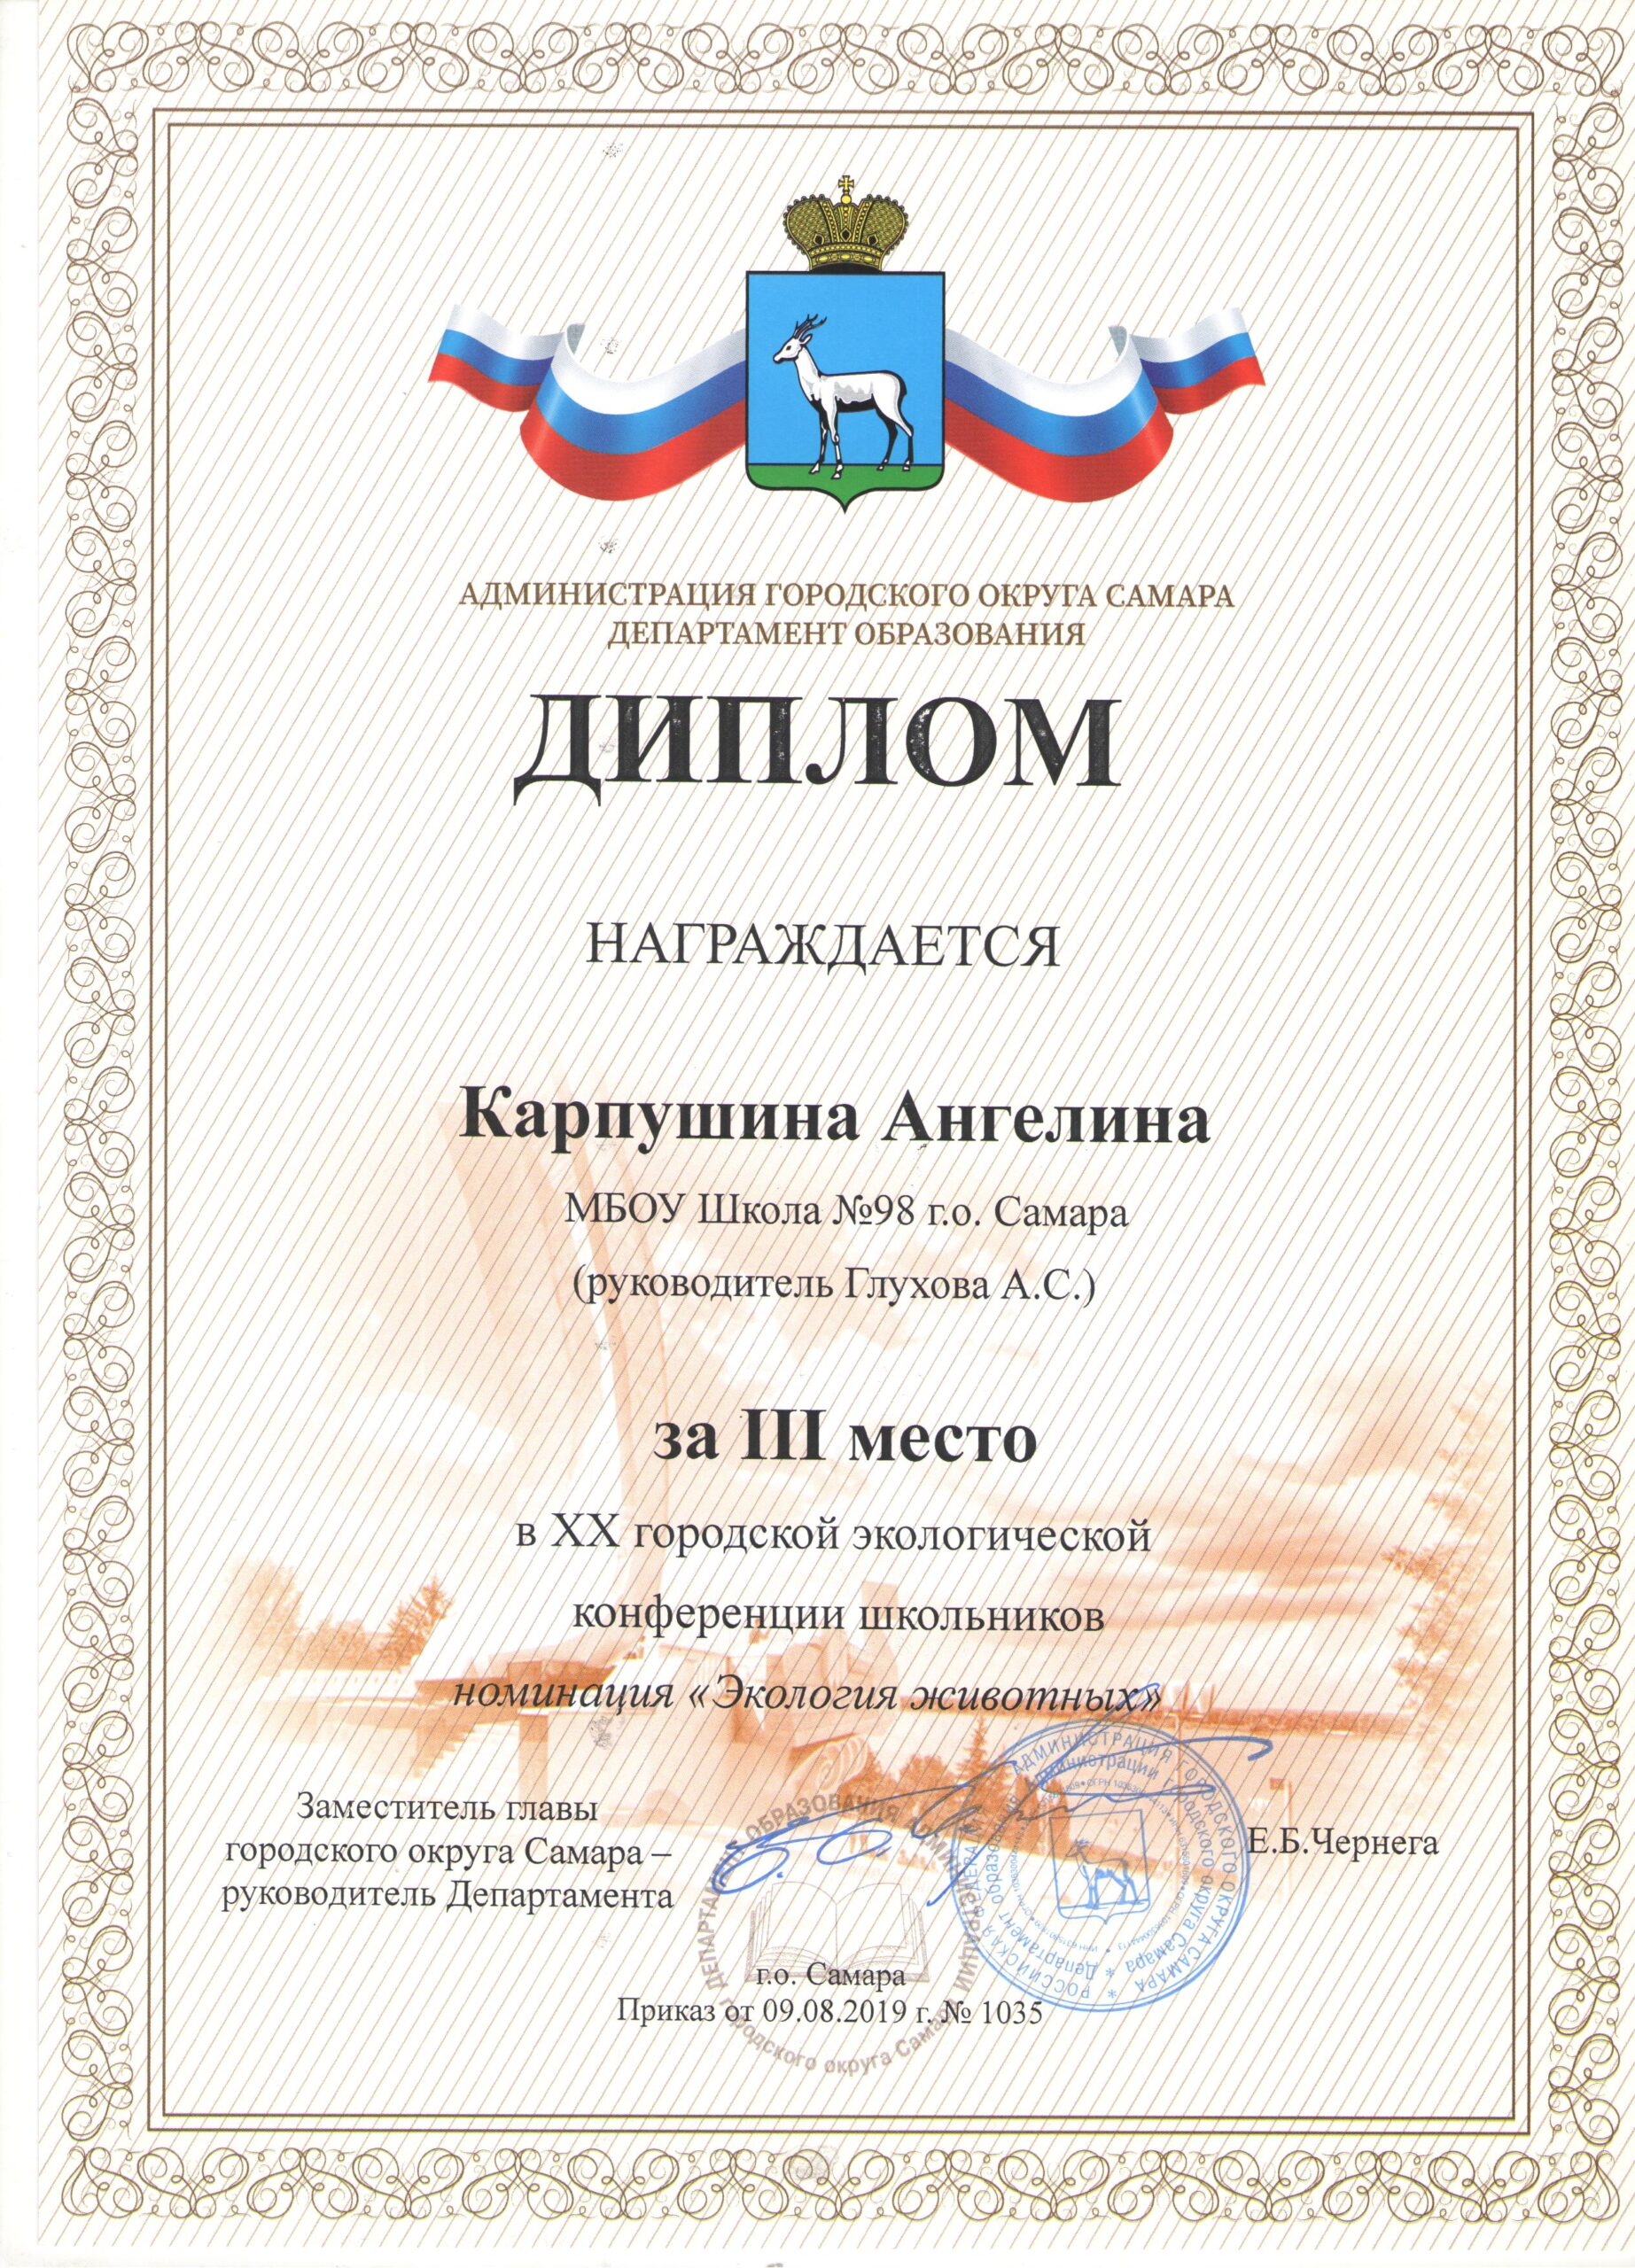 Карпушина 001